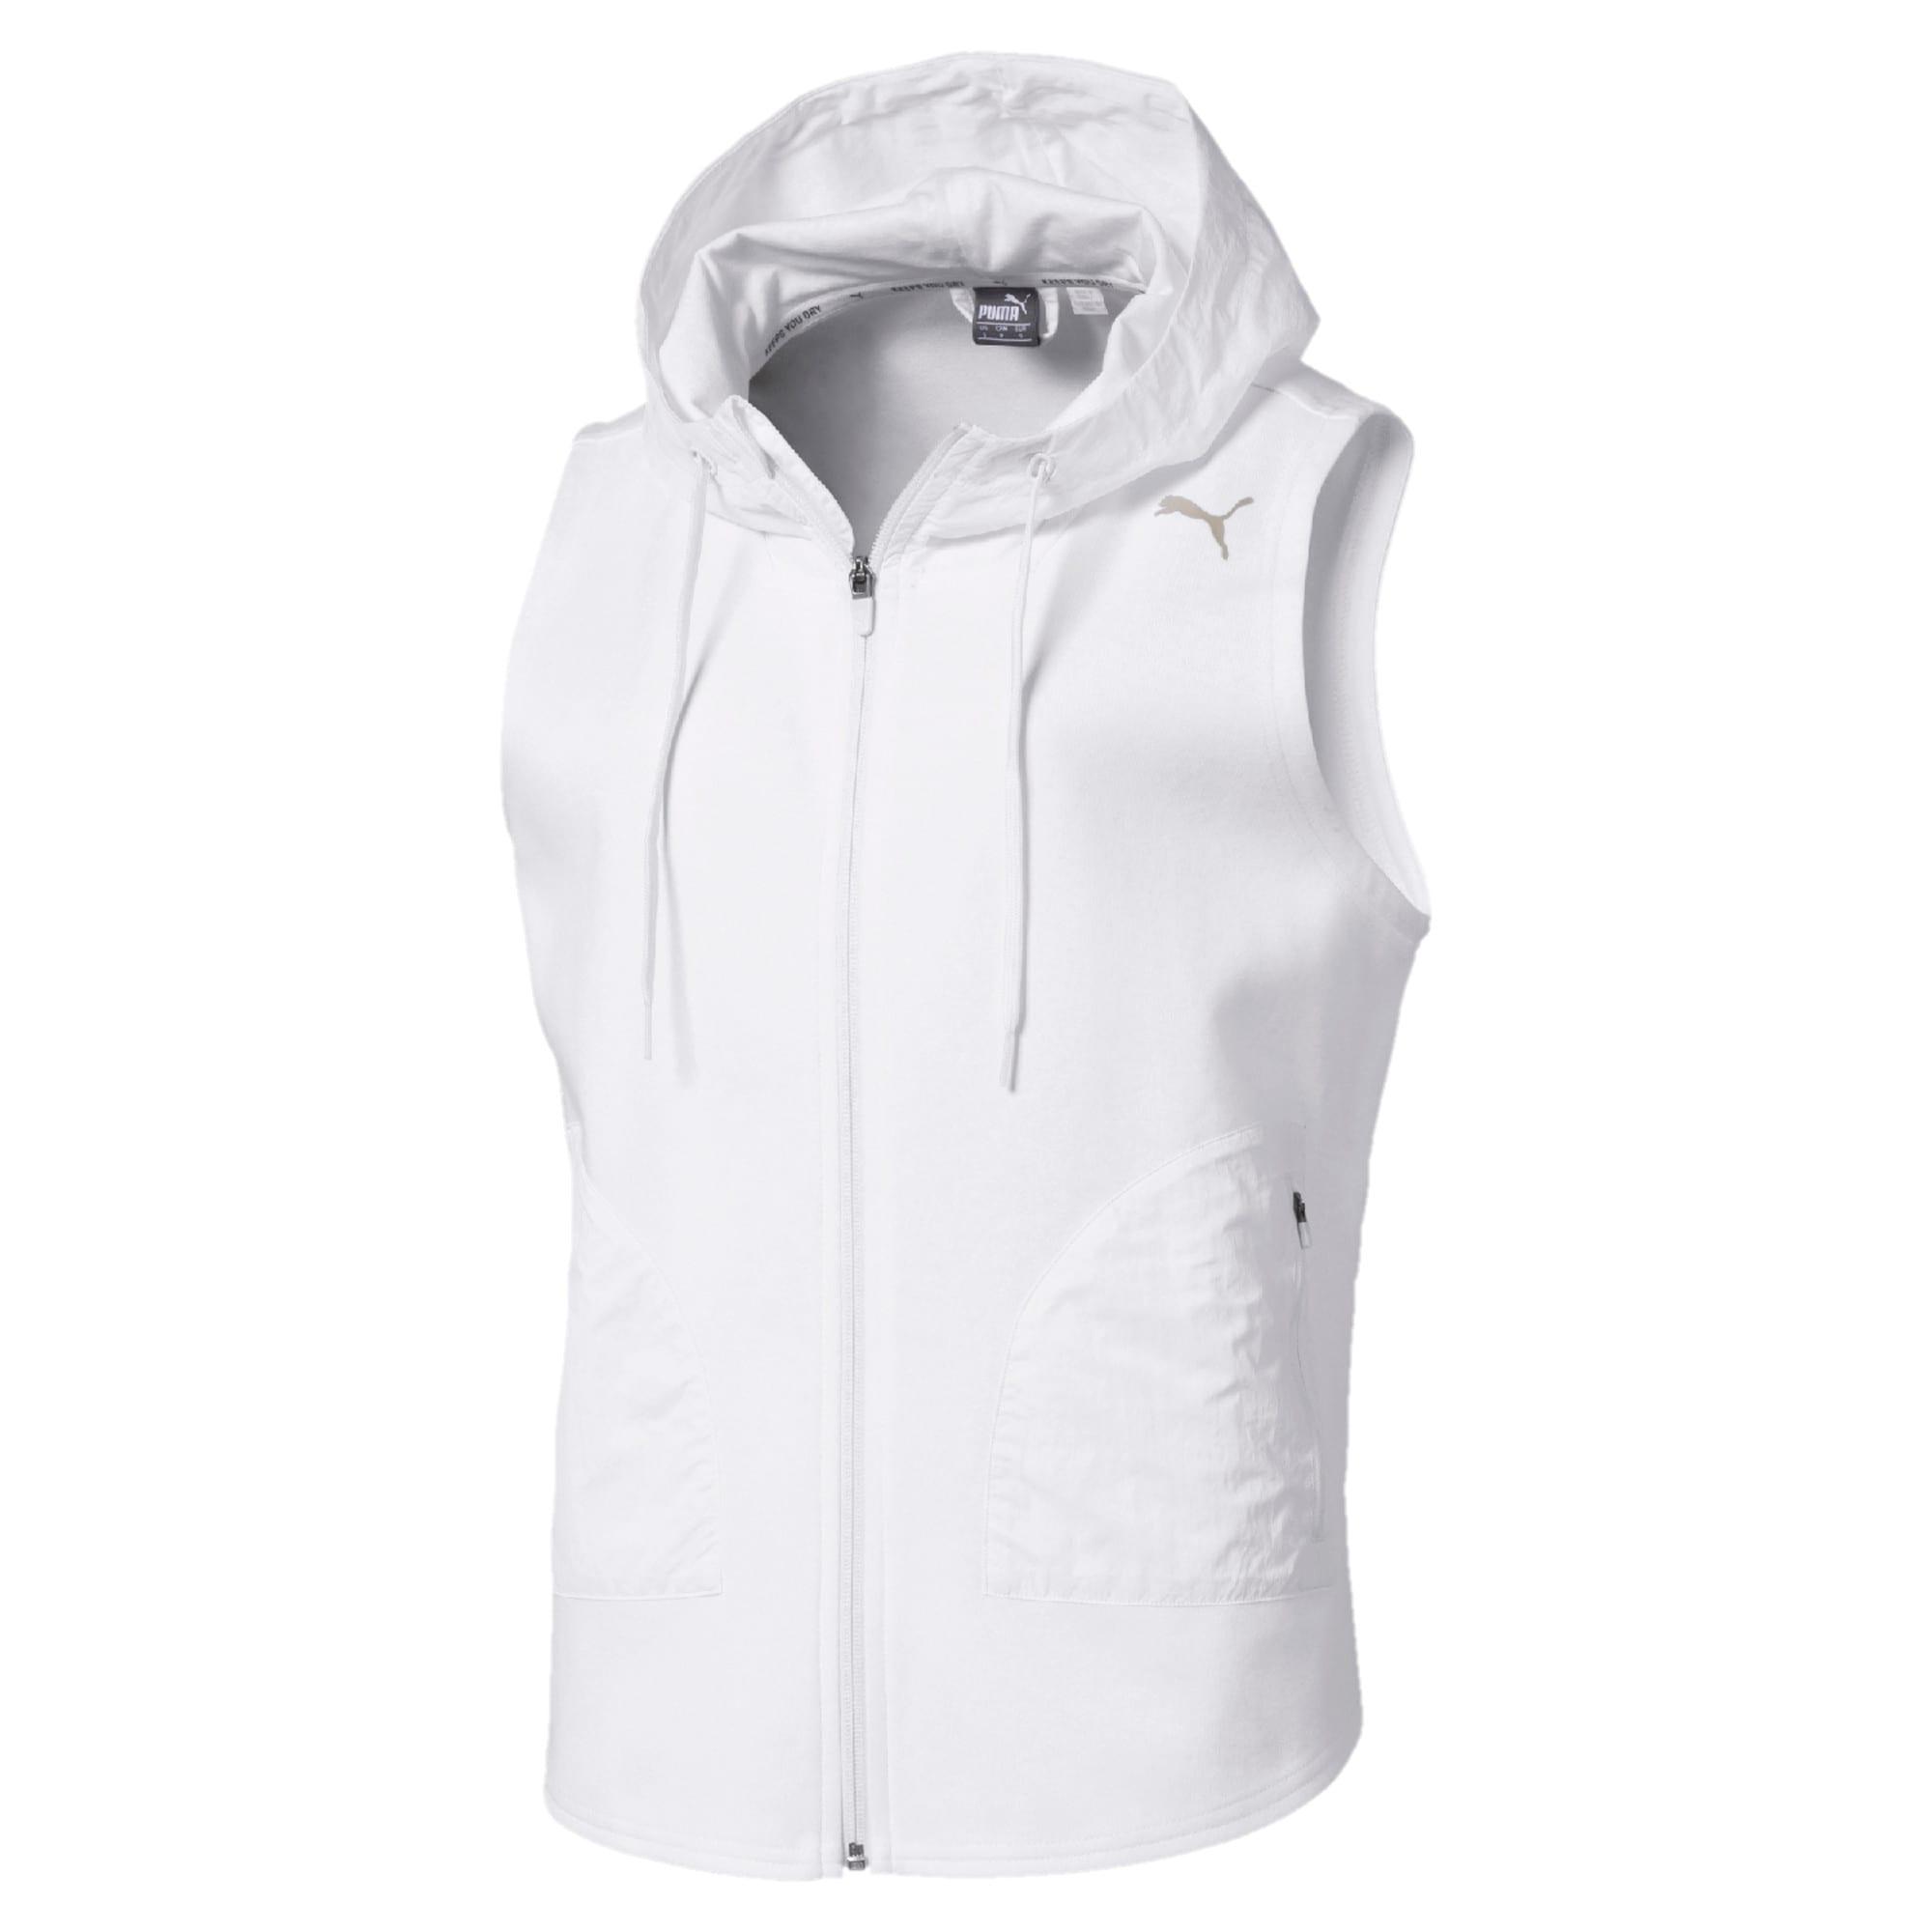 Thumbnail 1 of Evostripe Lite Women's Sleeveless Hooded Jacket, Puma White, medium